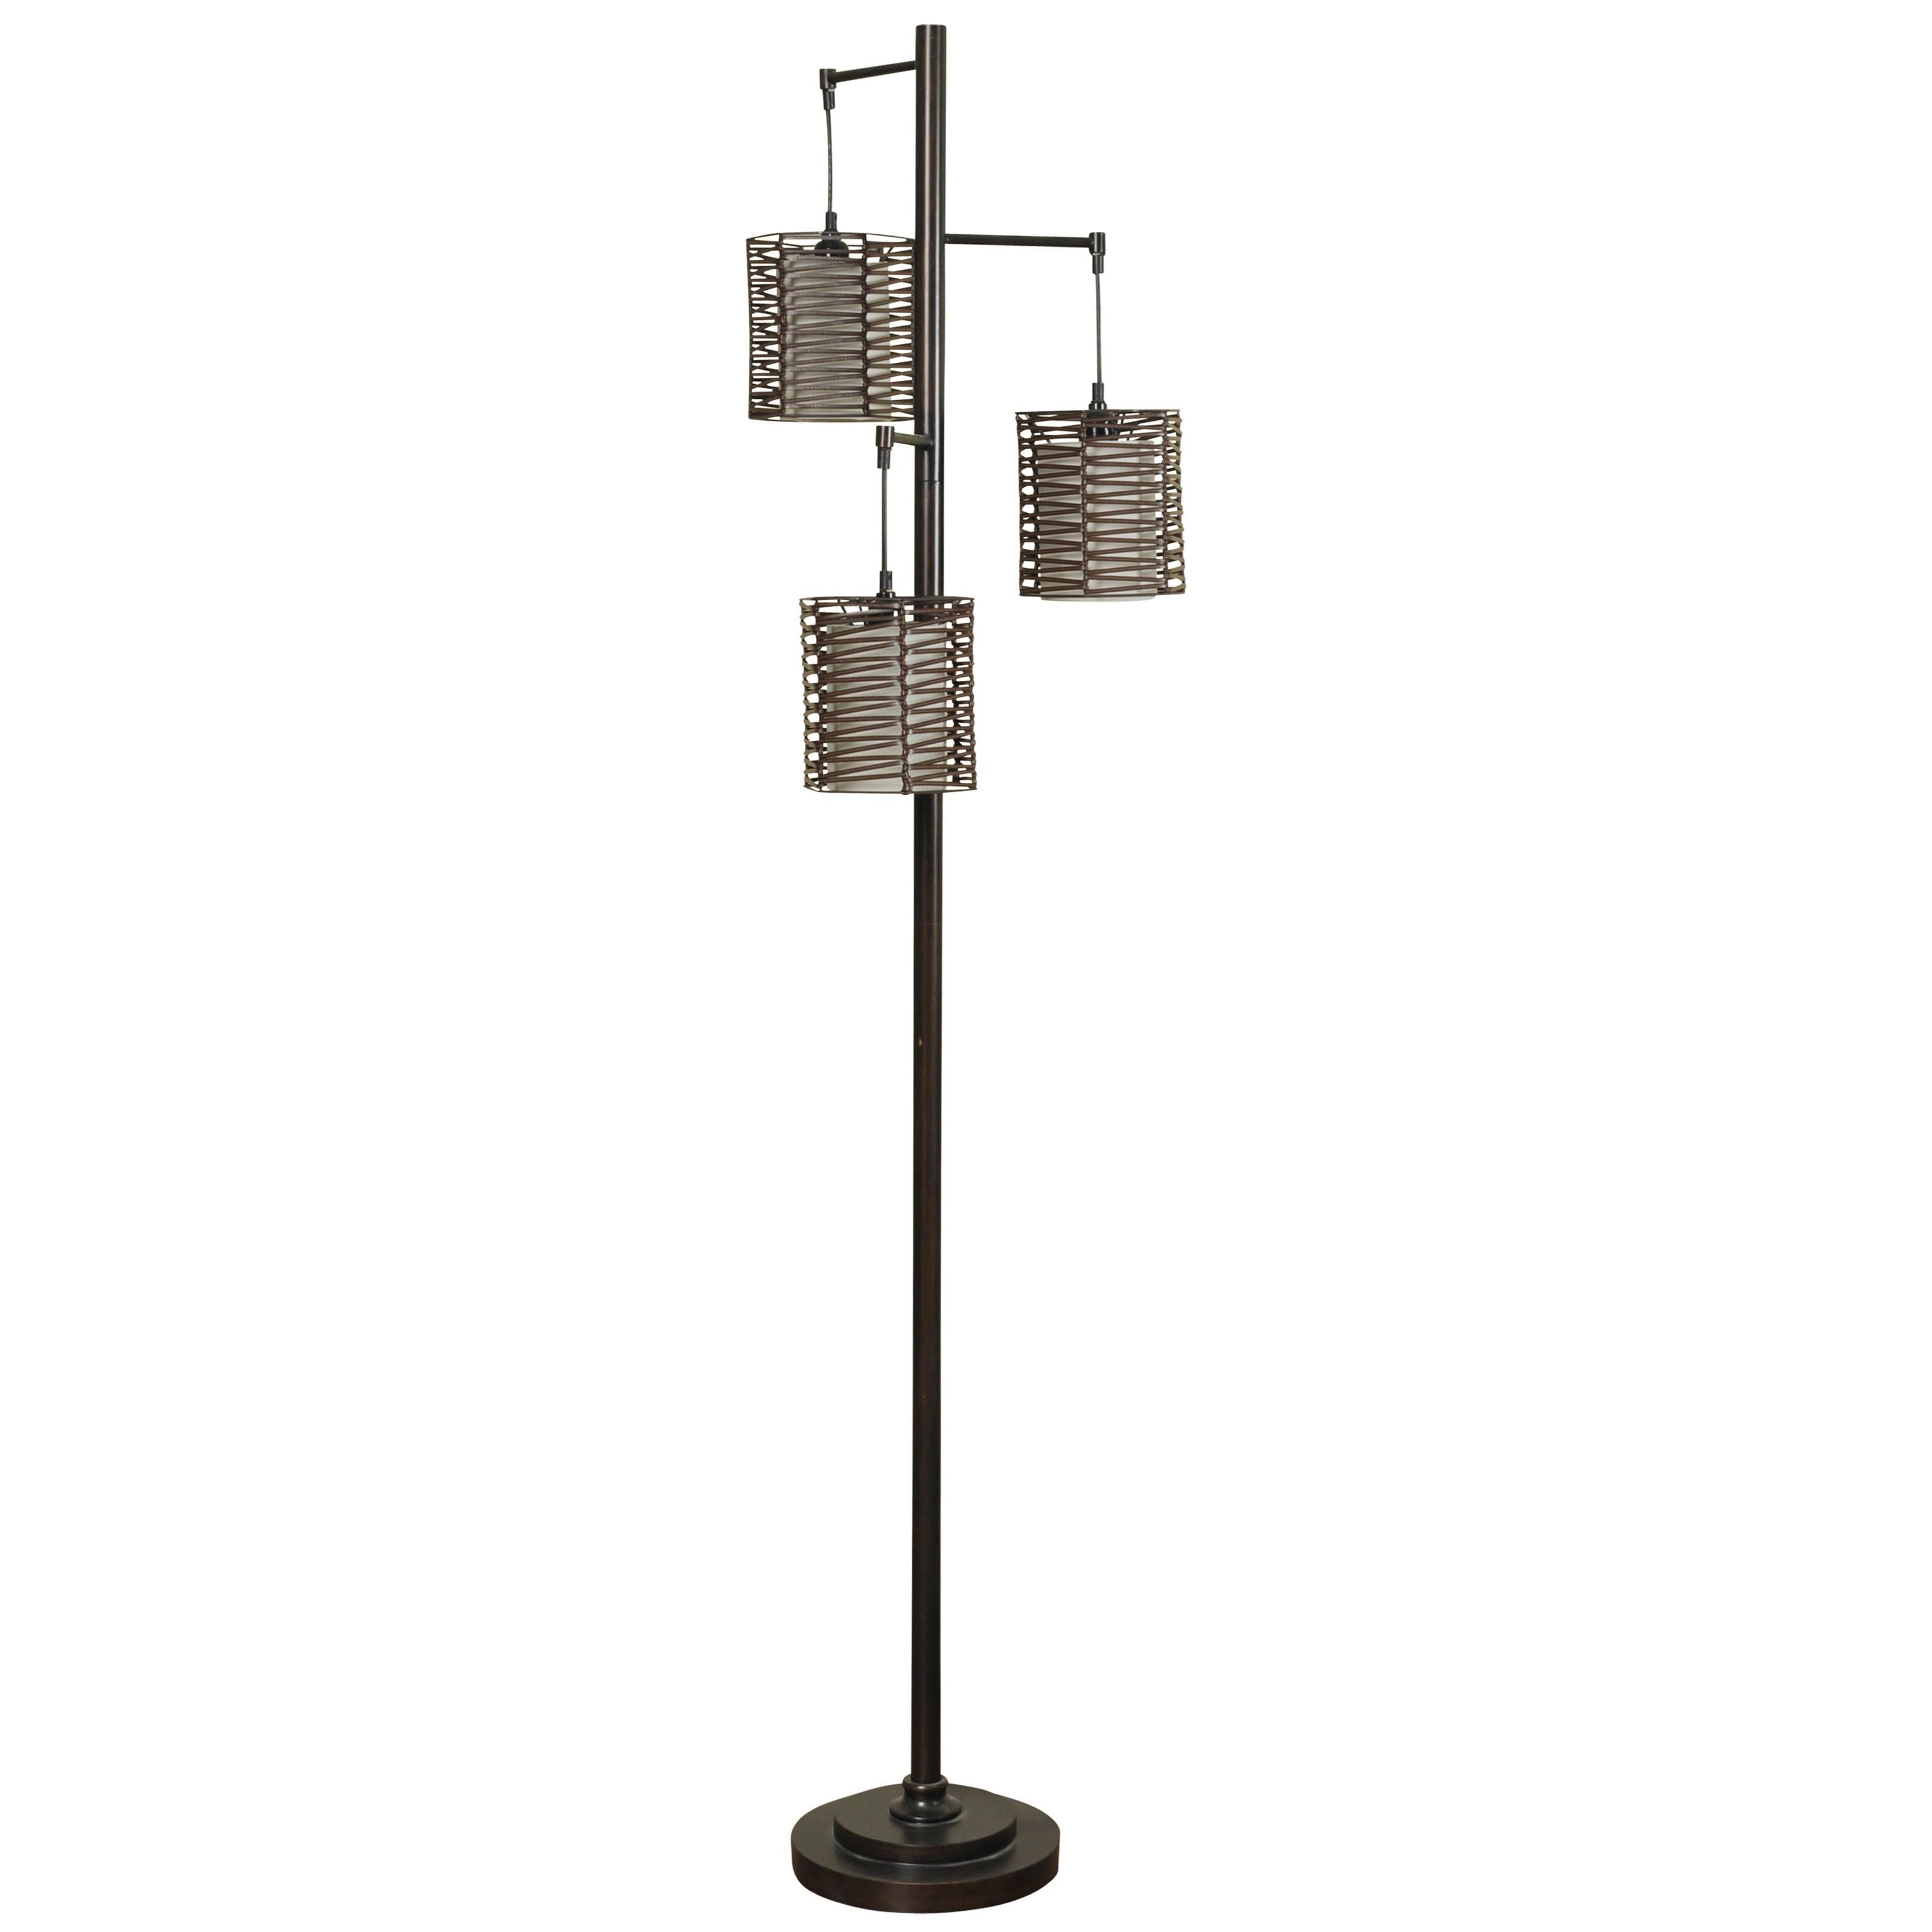 Lamps Contemporary Metal Floor Lamp at Ruby Gordon Home